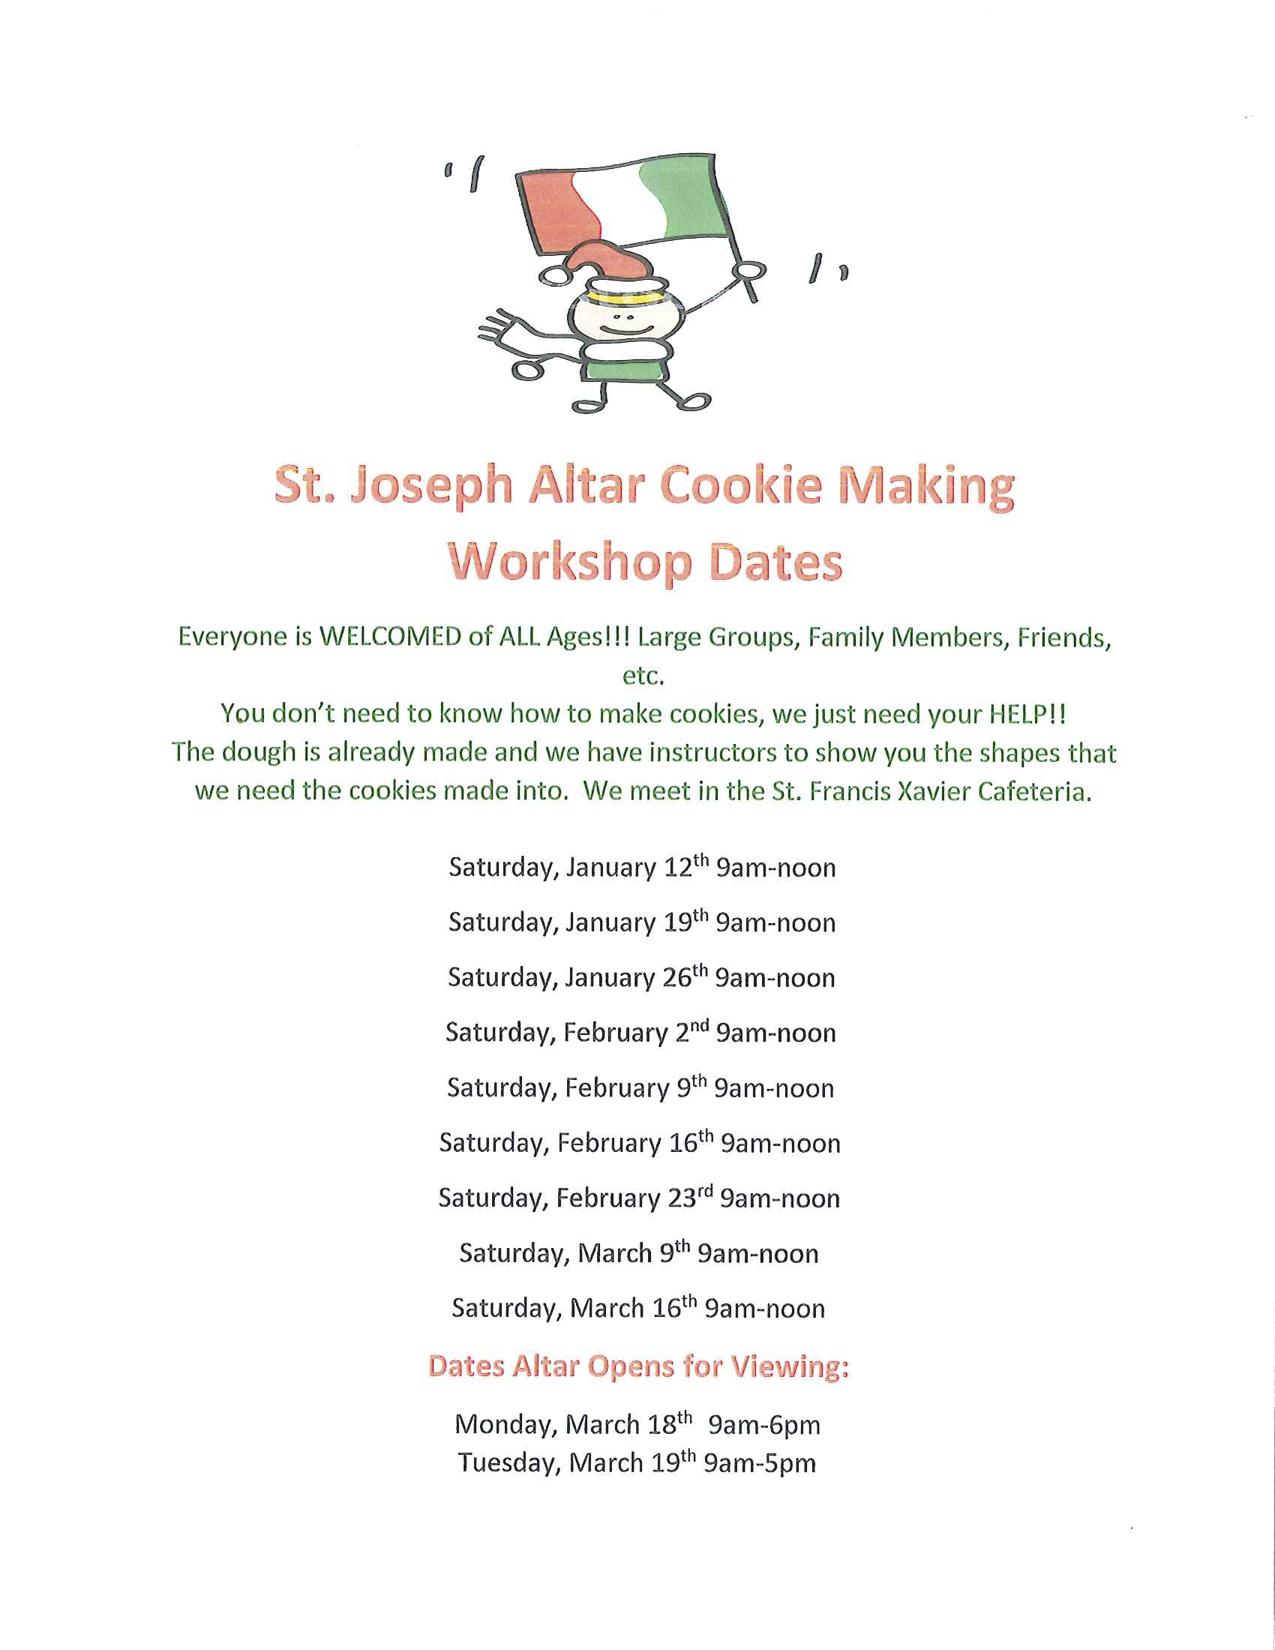 St. Joseph Altar Dates.png